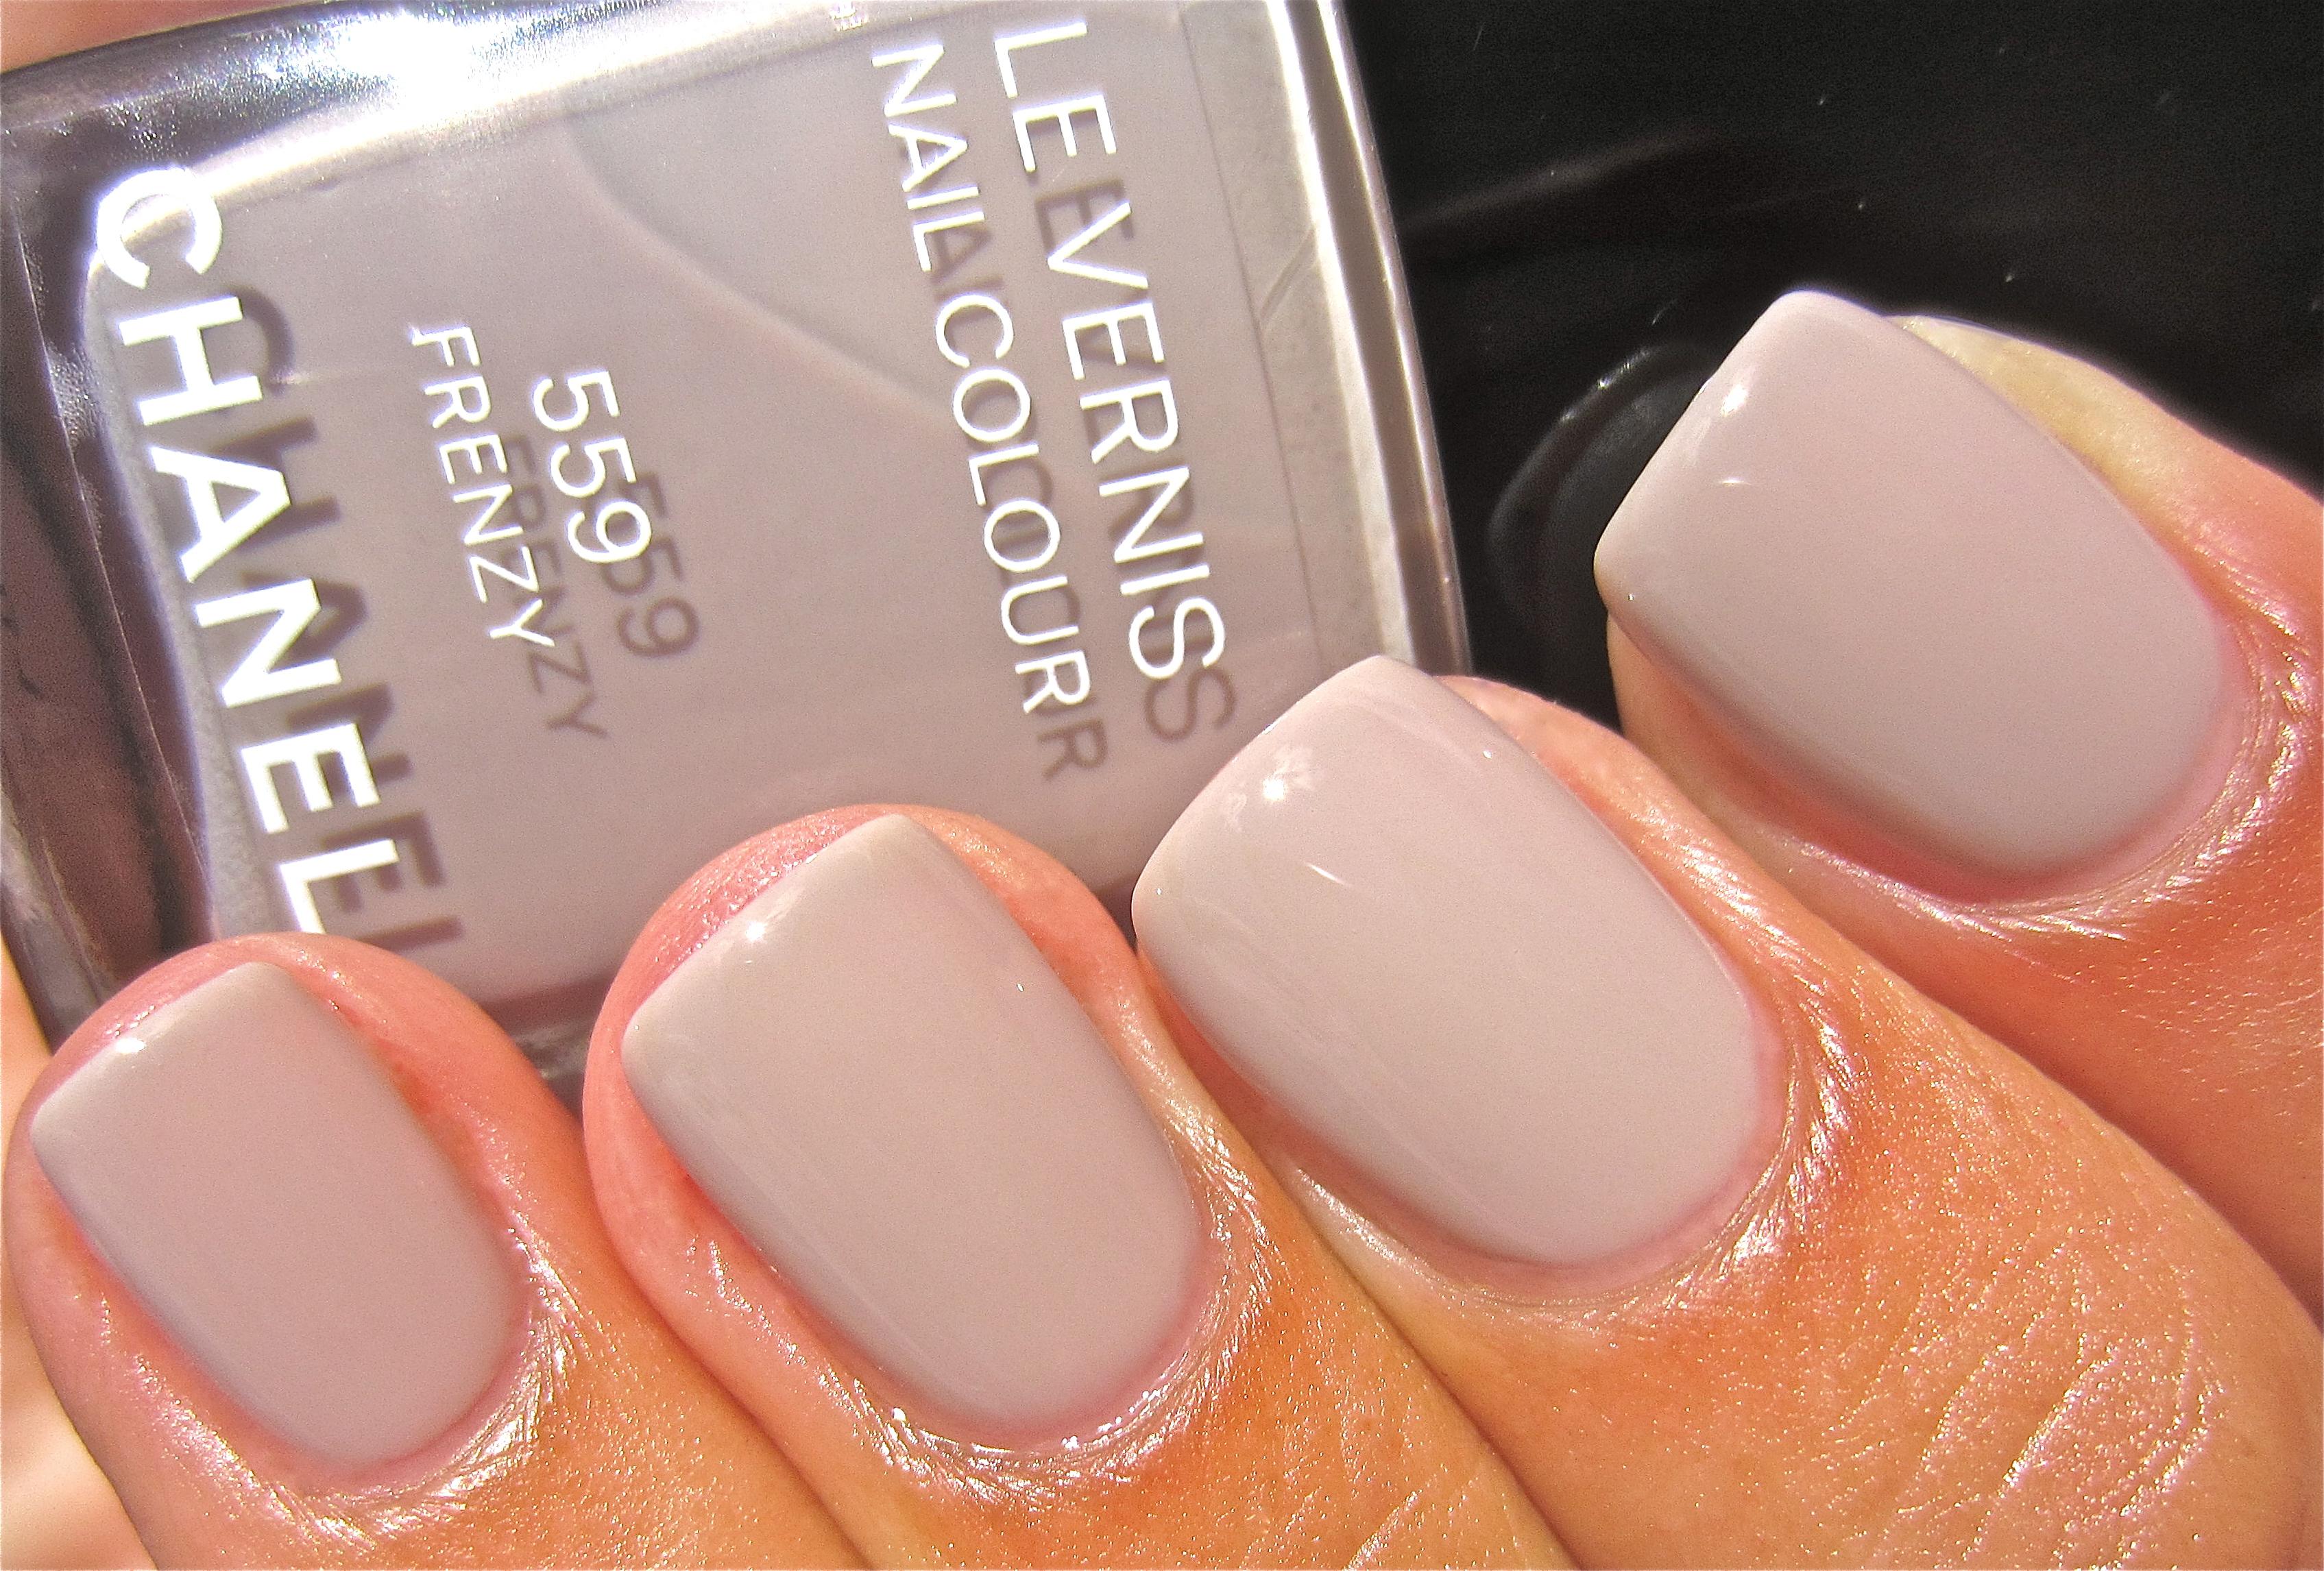 Chanel nail polish – ommorphia beauty bar